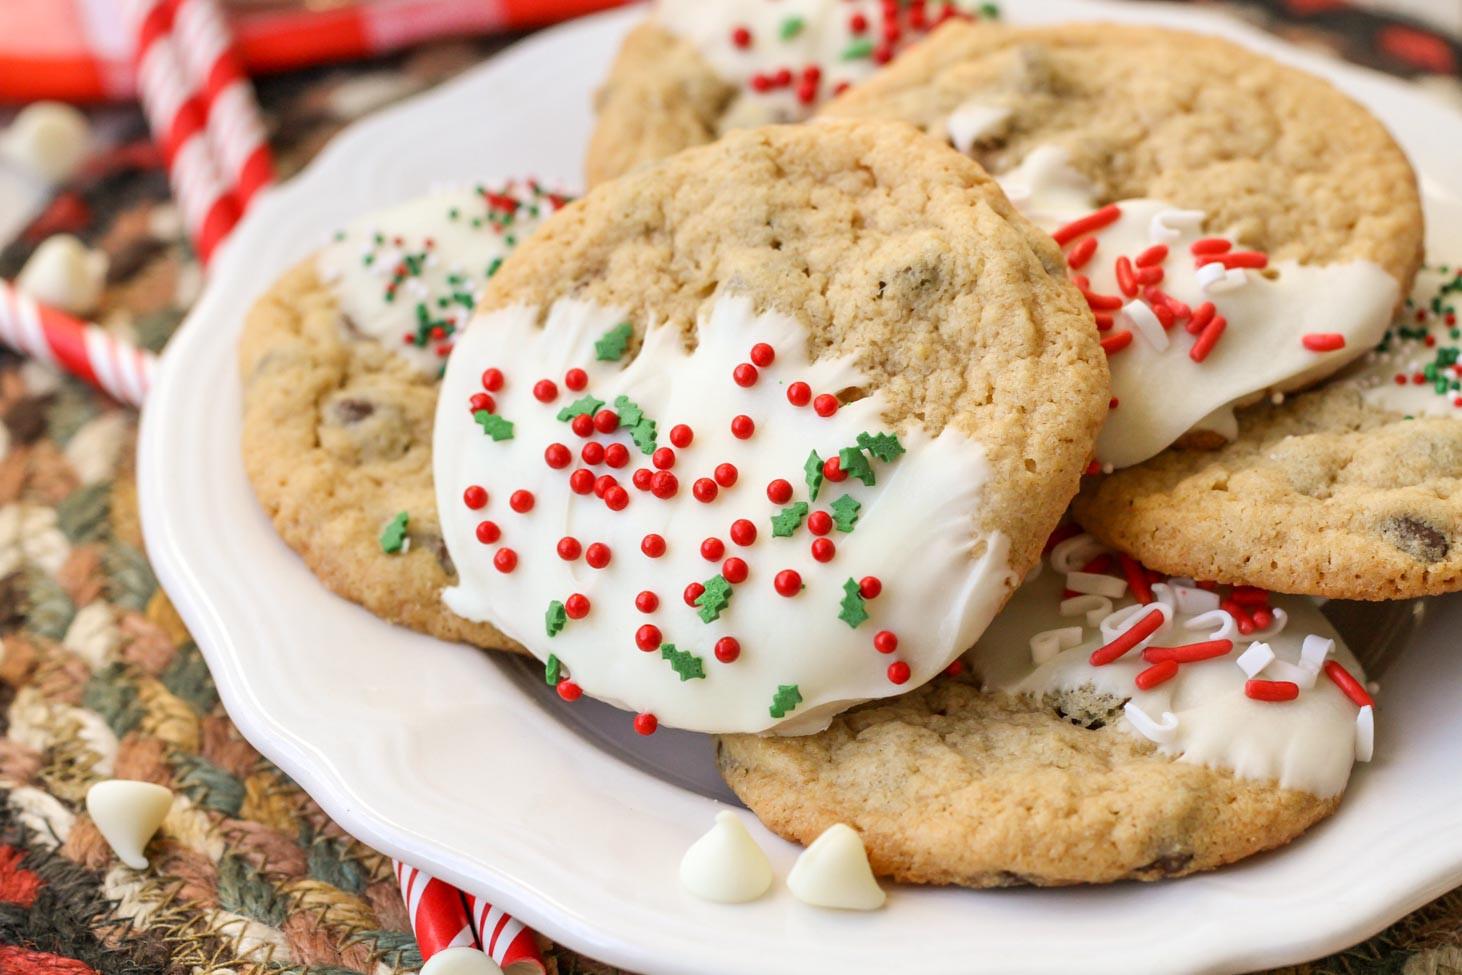 Chocolate Chip Christmas Cookies  Christmas Chocolate Chip Cookies Beyond Easy To Make